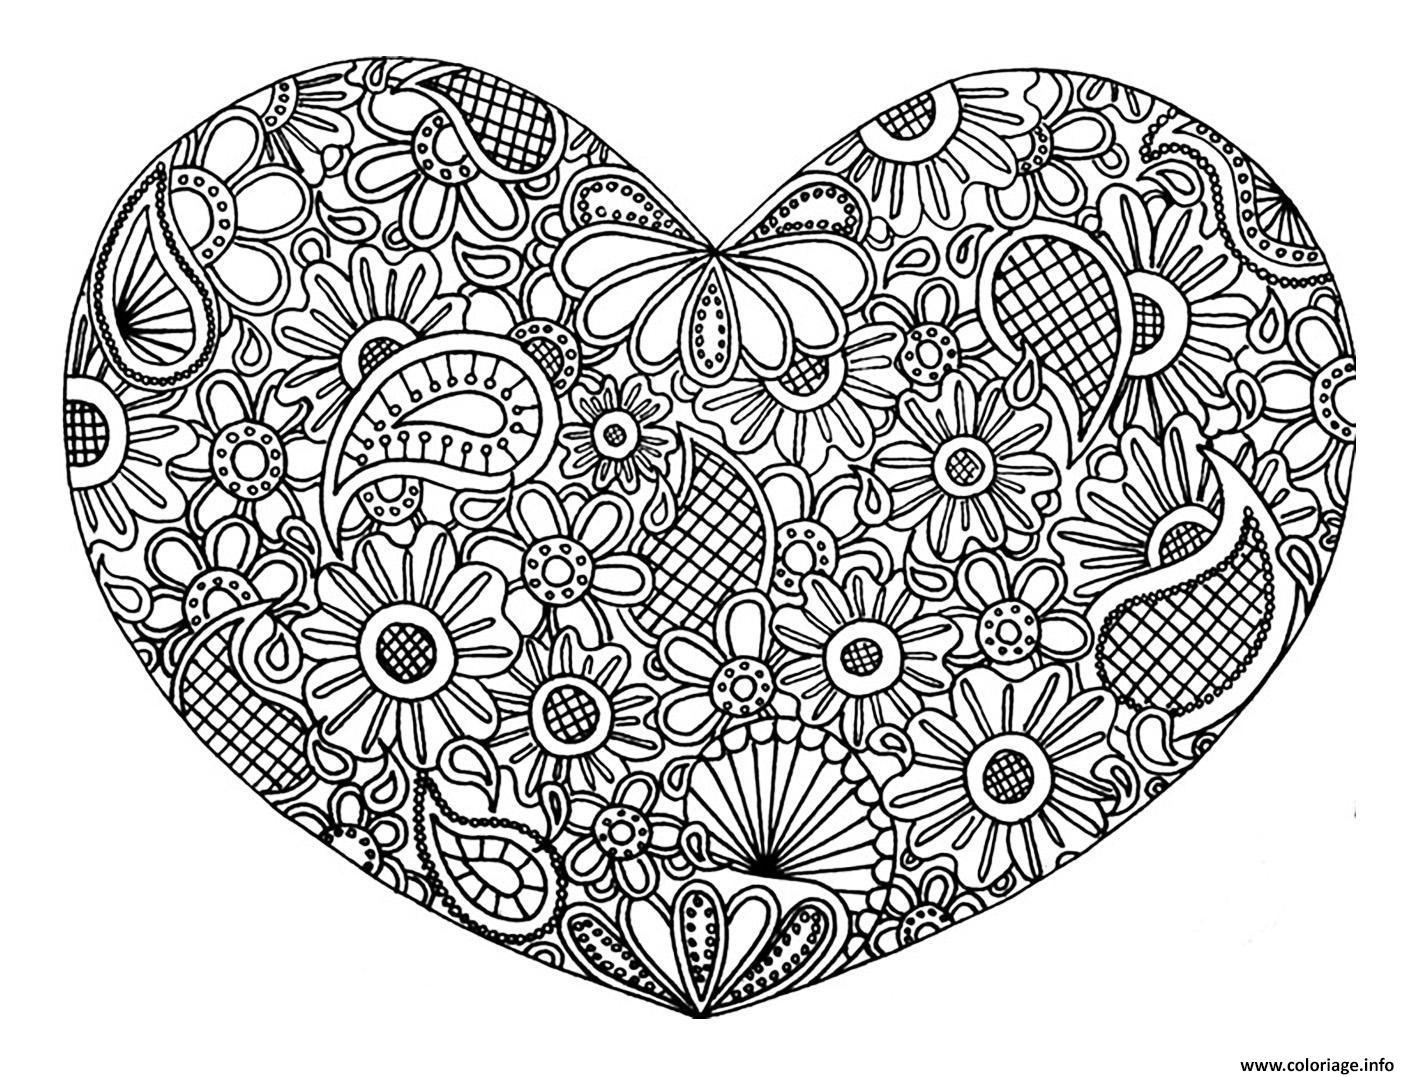 Coloriage Adulte Coeur Mandala Fleurs Zen Stvalentin Jecolorie Com